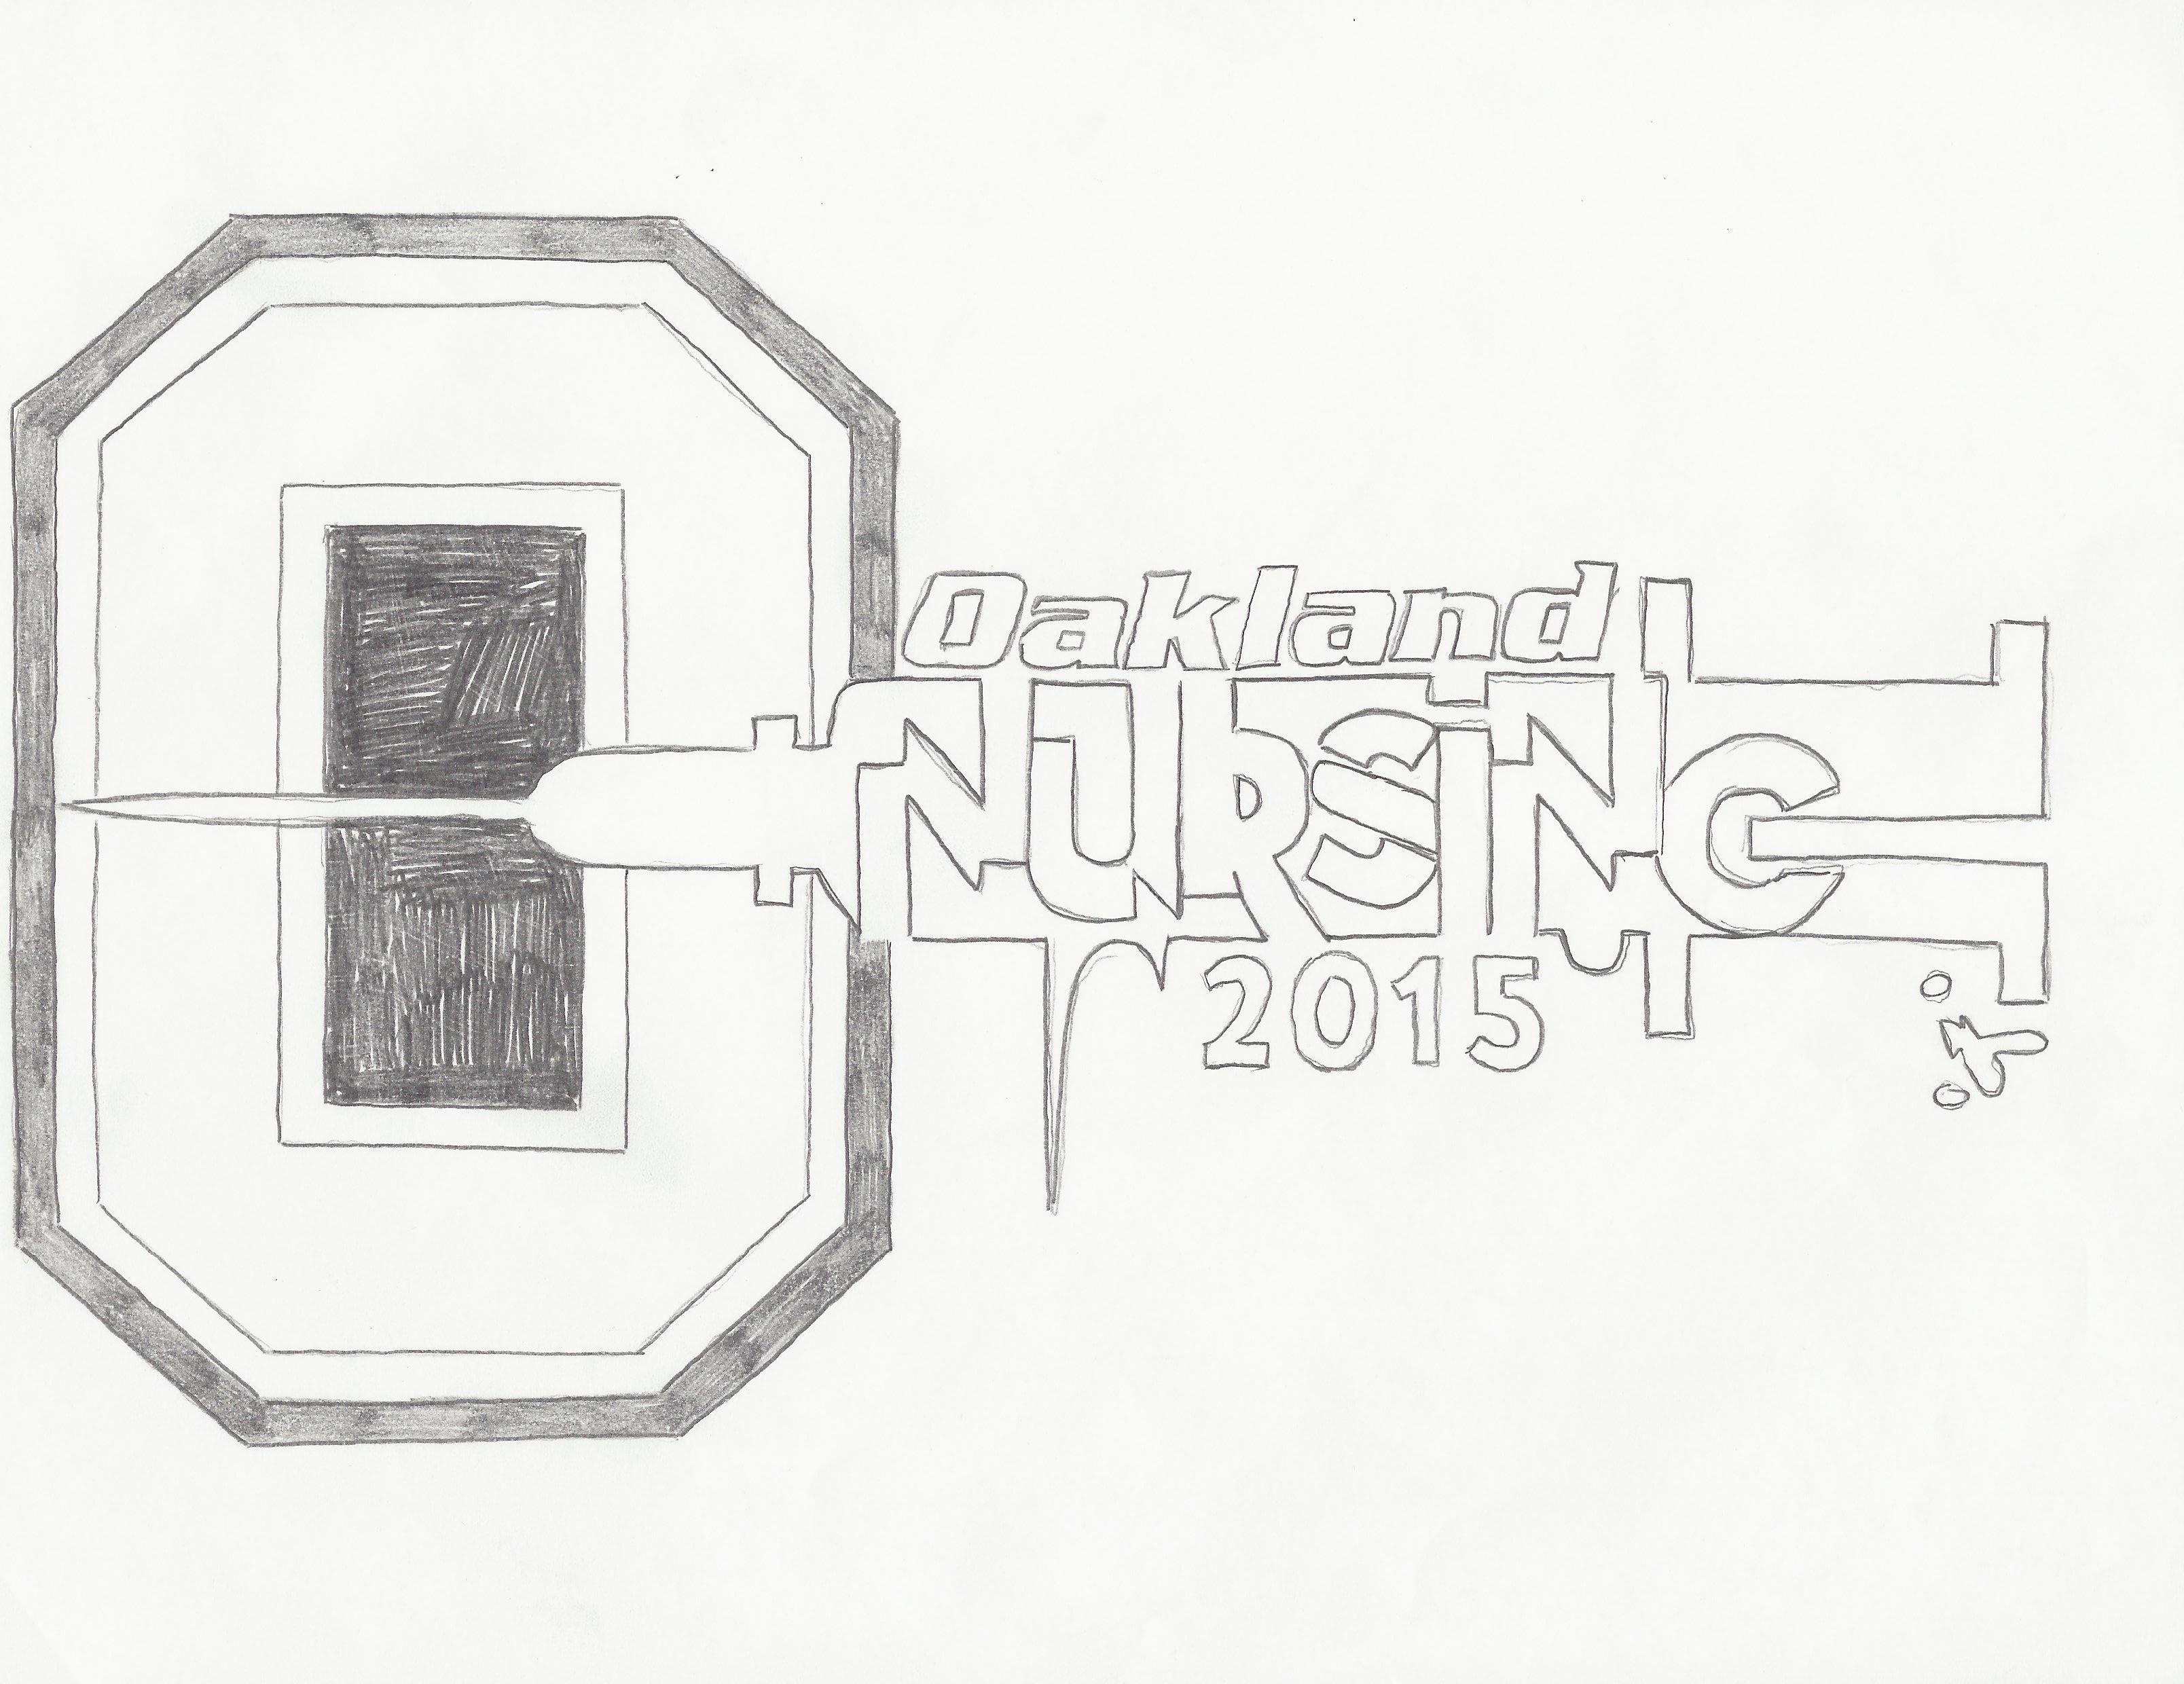 Oakland University Nursing Class of 2015 Logo (IDEA) (With